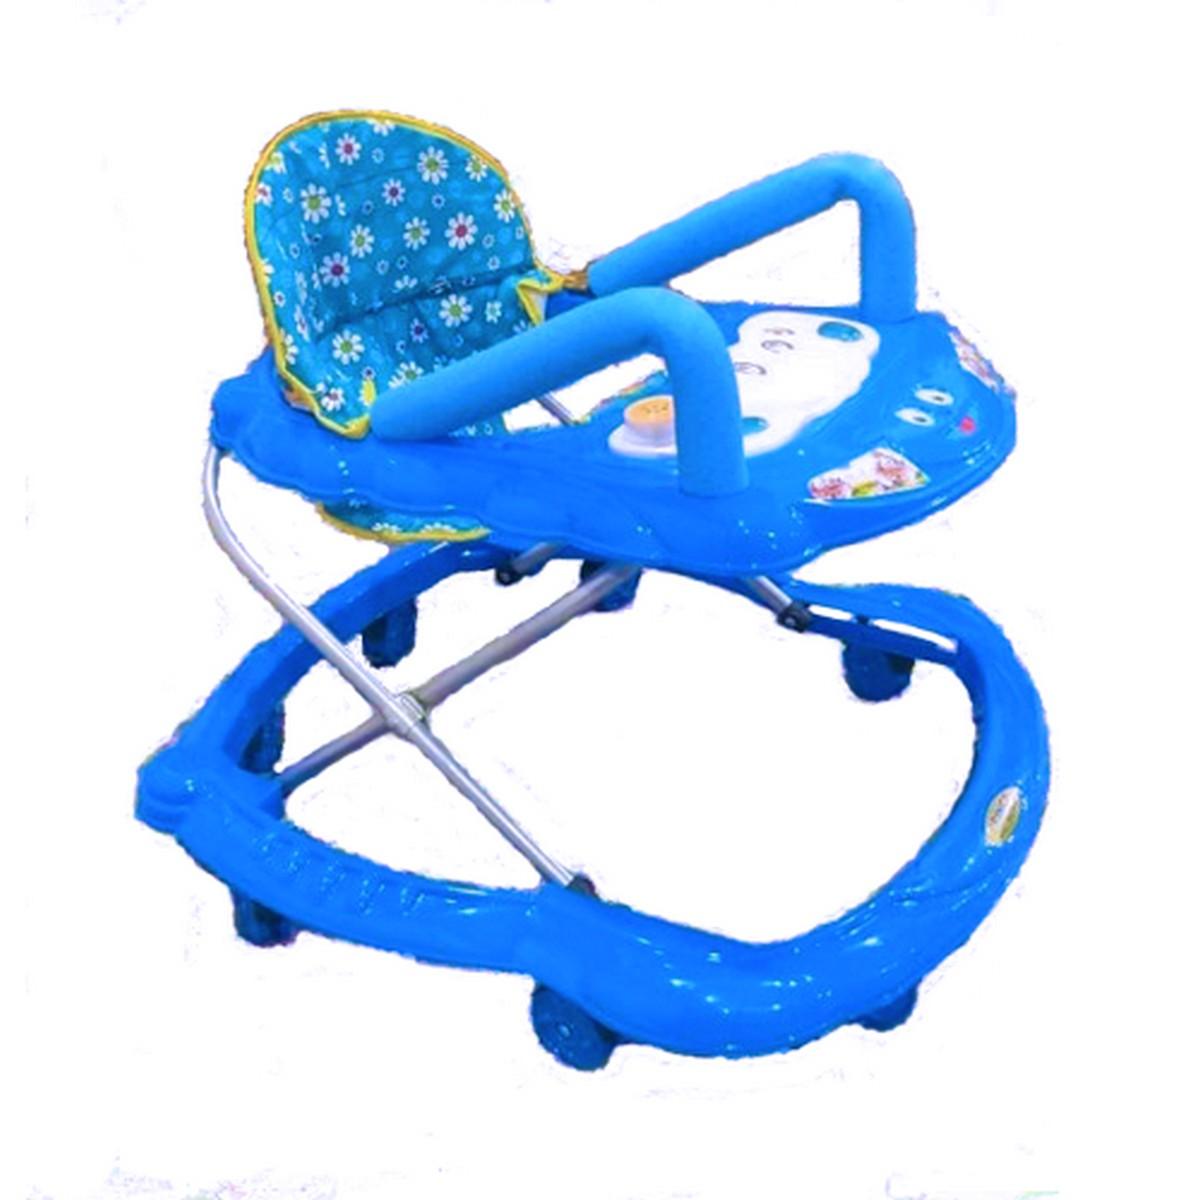 08 Wheel Foam Handle Music Tray Kids Walker  Baby walker in 03 colors for toddlers